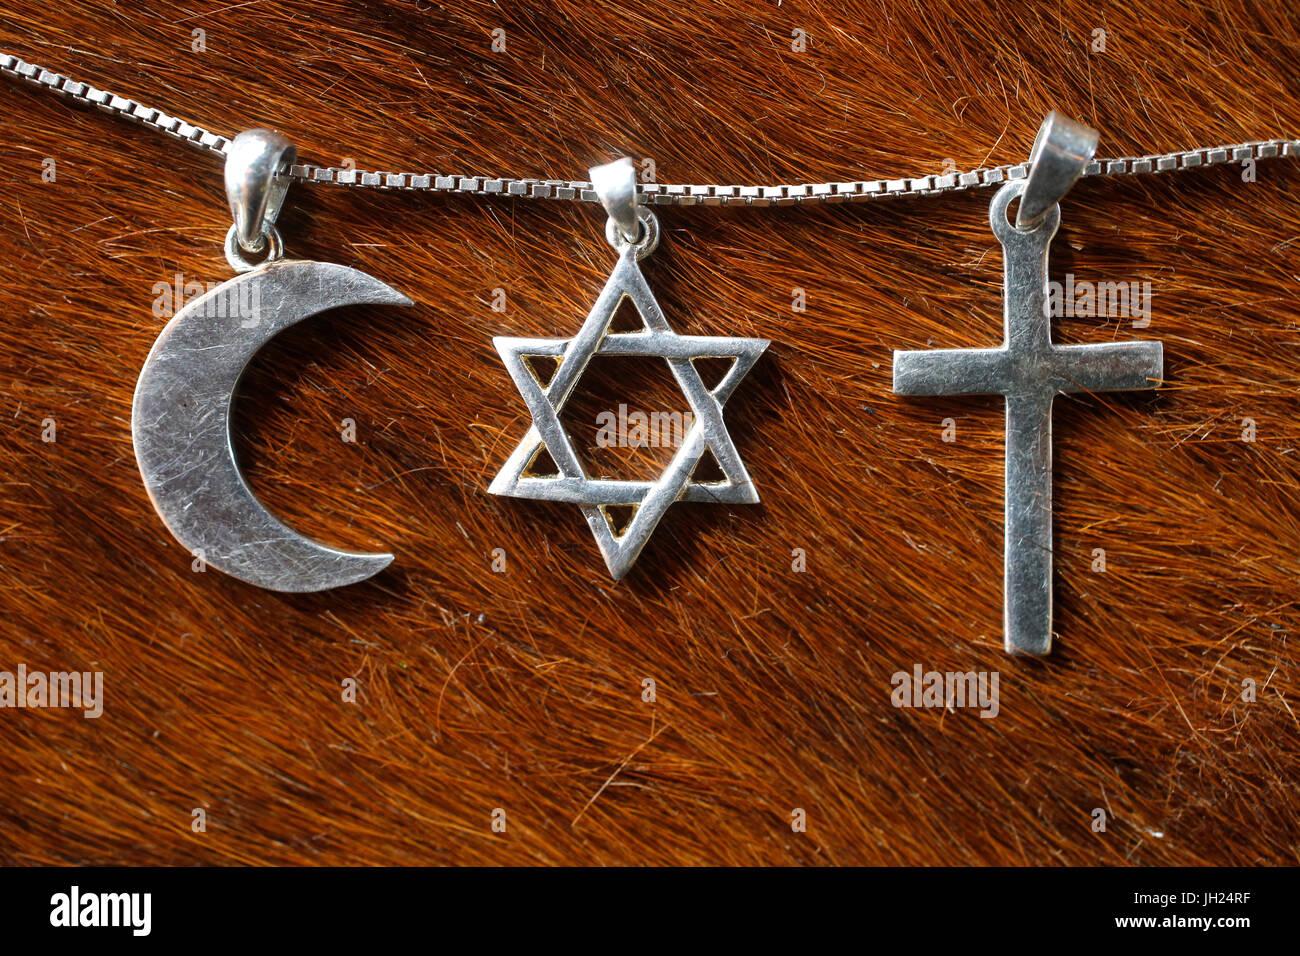 Simboli di islam ebraismo e cristianesimo. Immagini Stock